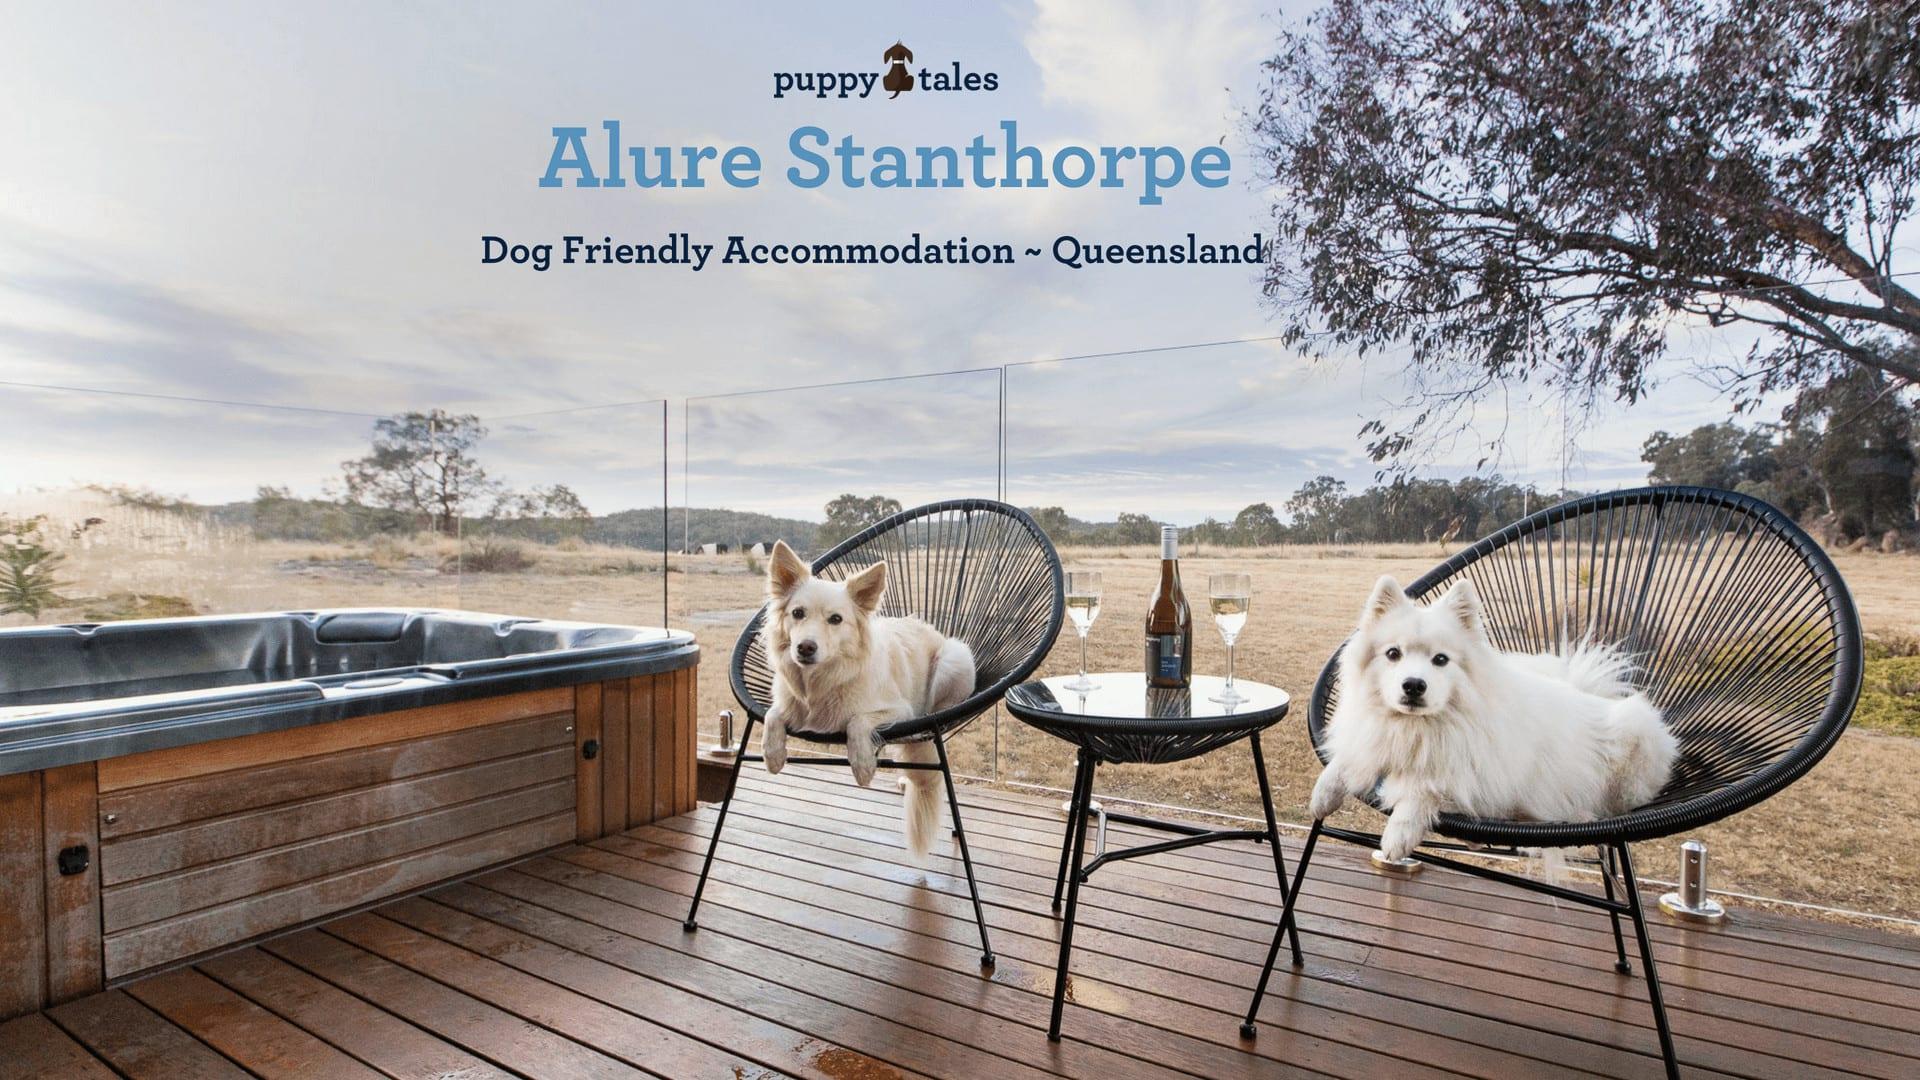 Alure Stanthorpe Dog Friendly Accomodation in Queensland